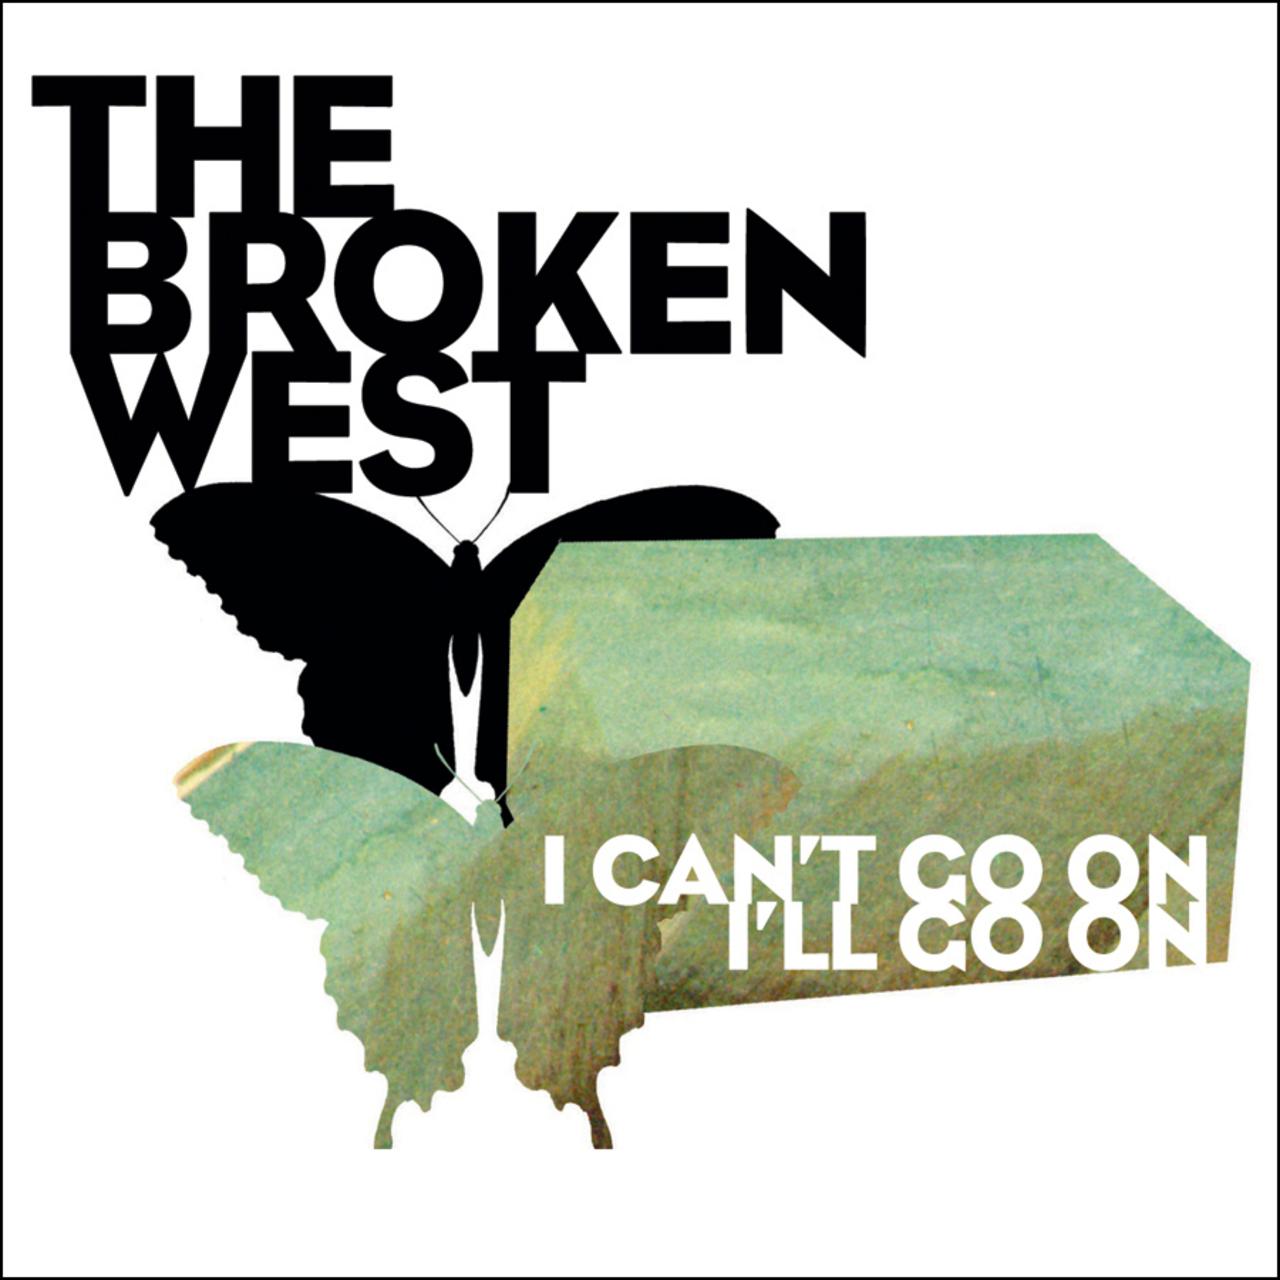 The Broken West's I Can't Go On, I'll Go On is out now.